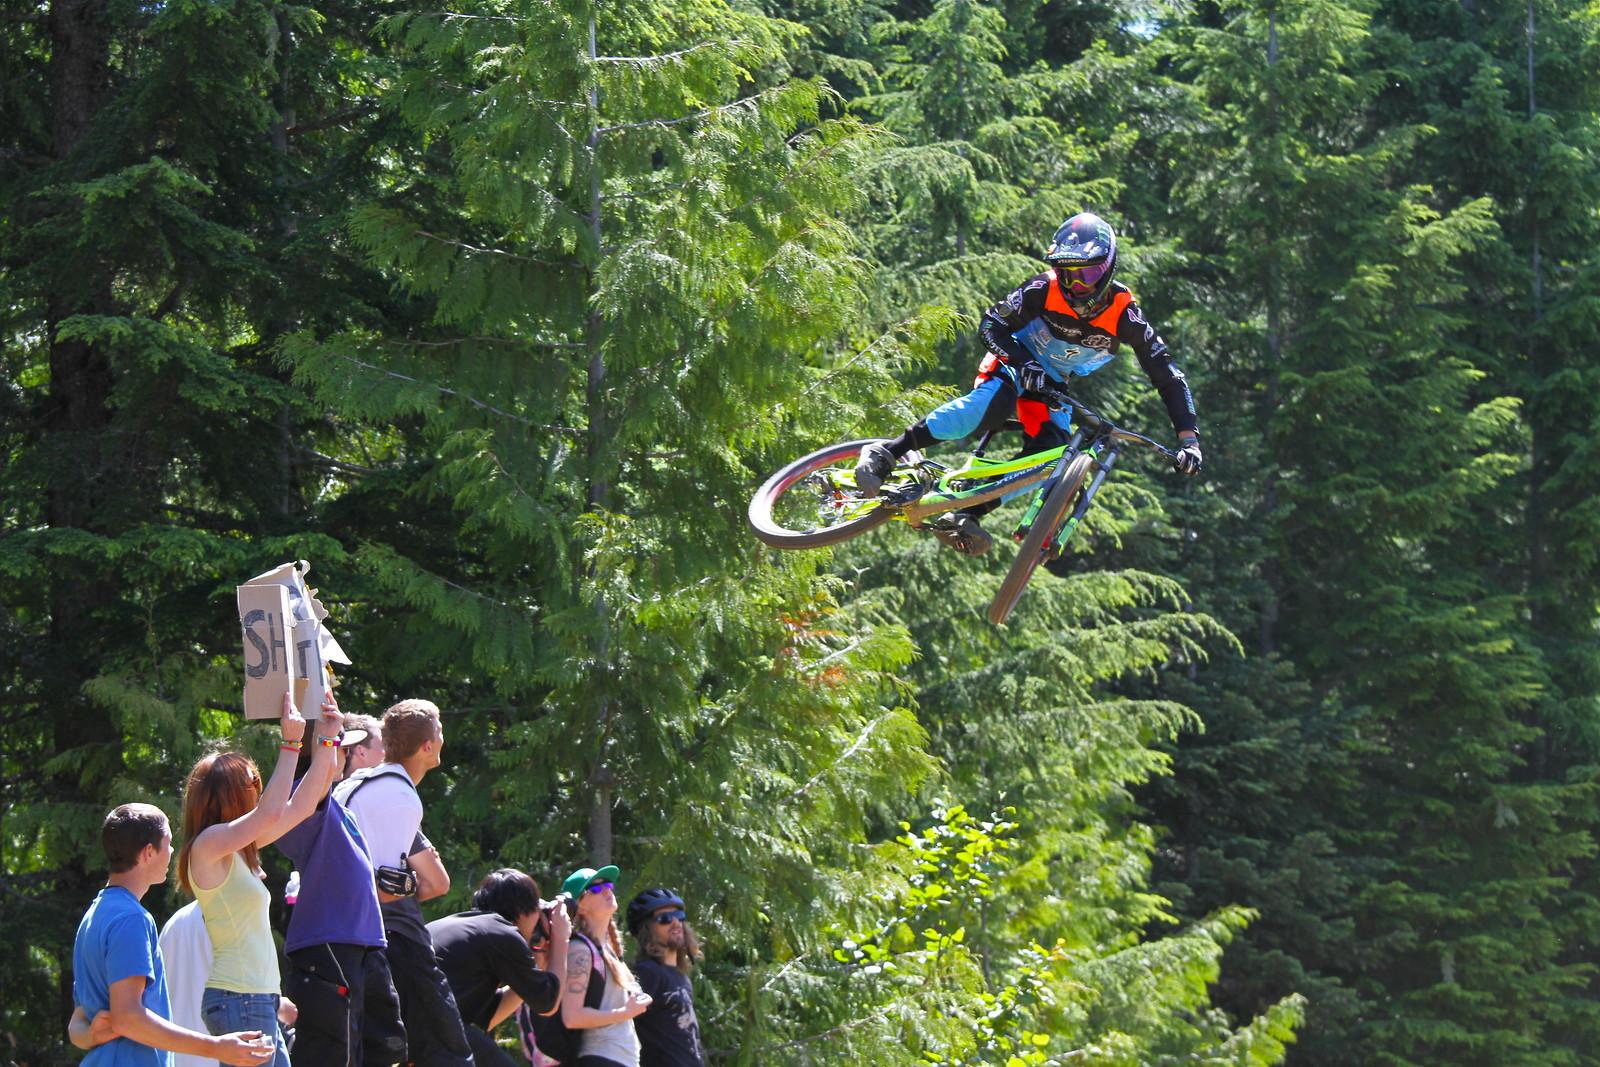 Troy Brosnan - Malcolm Mclaws - Mountain Biking Pictures - Vital MTB